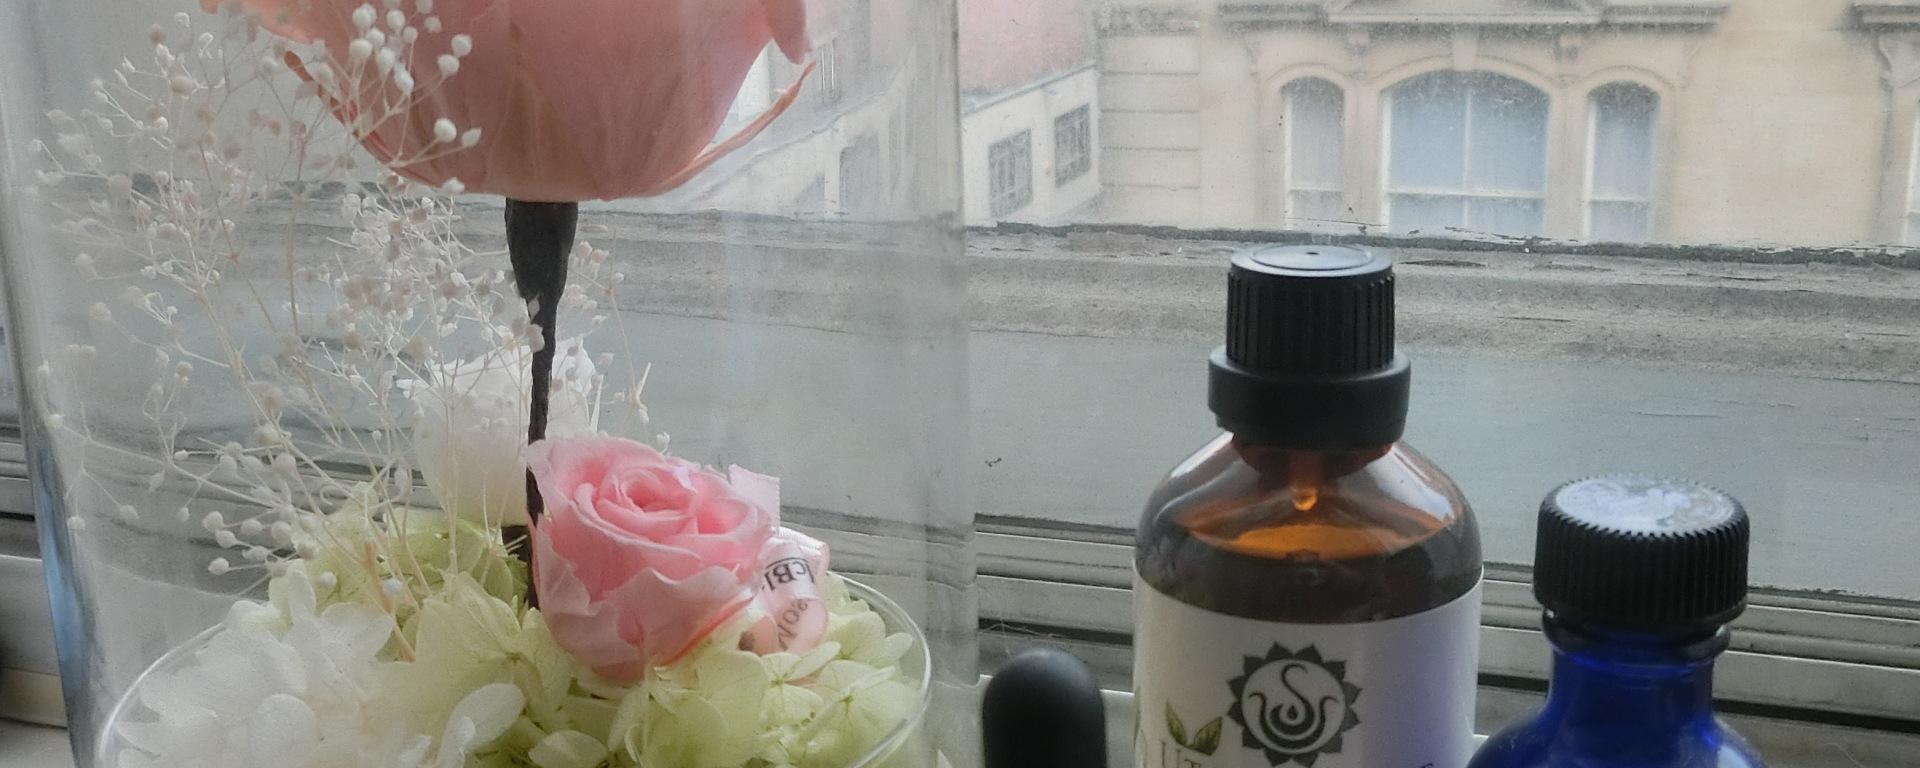 neals yard argan oil caudaliePolyphenol C15 jojoba oil